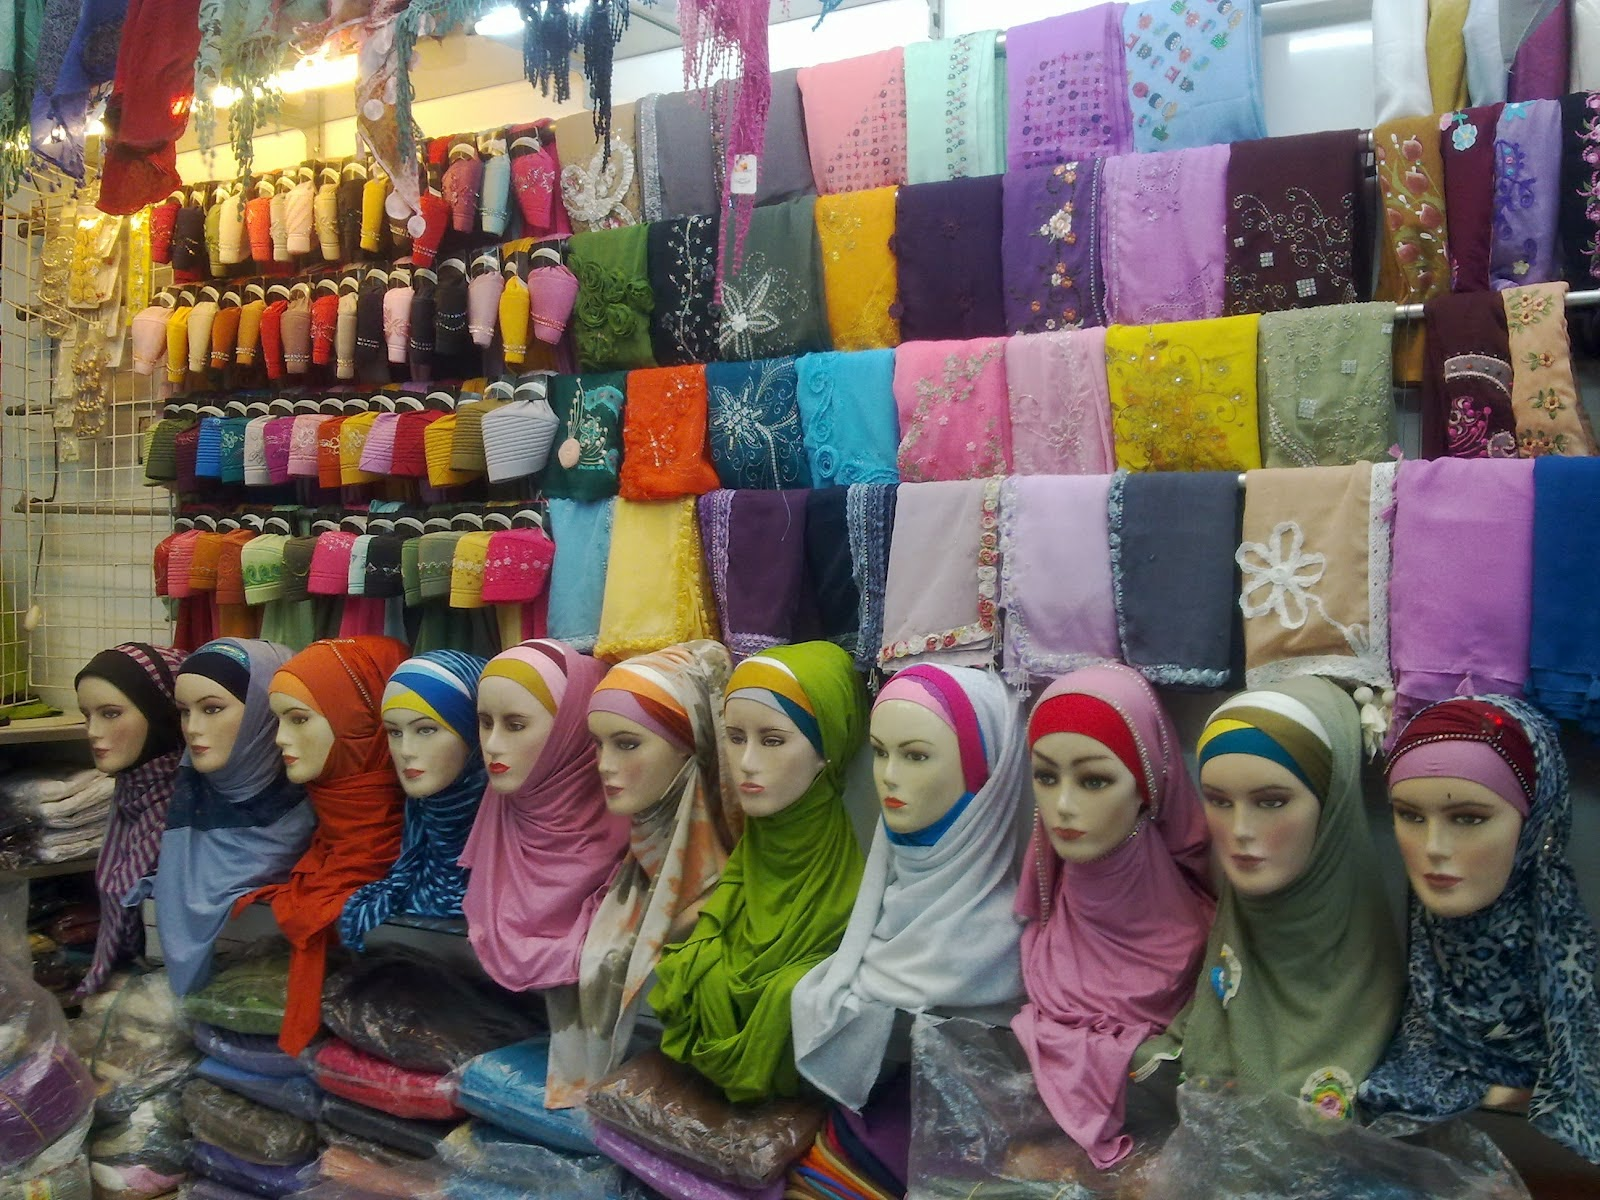 Tutorial Jilbab Pashmina Sifon Terbaru Untuk Wajah Bulat